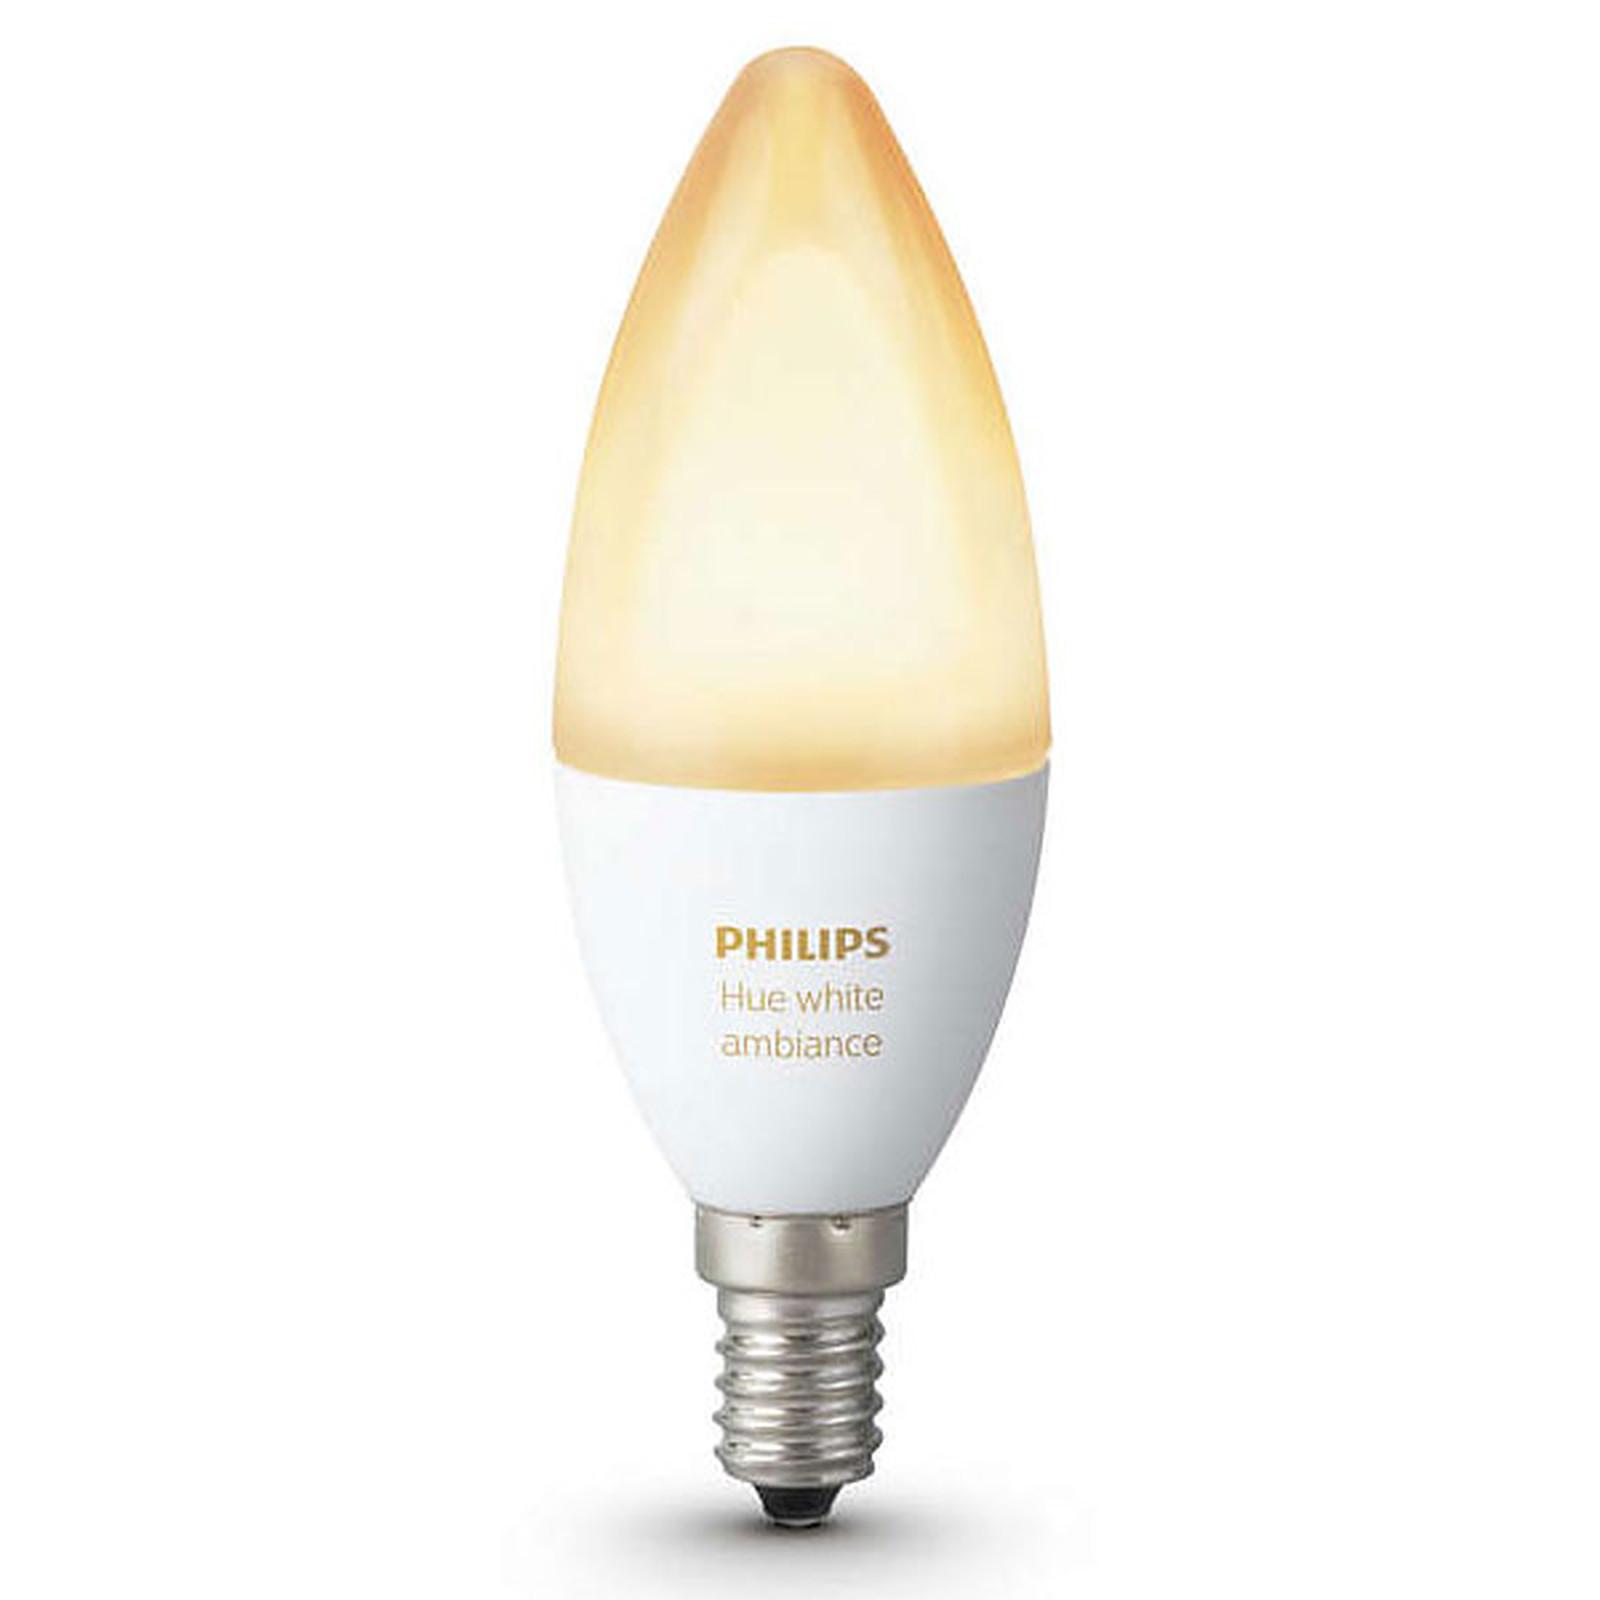 Philips Hue White Ambiance Flamme E14